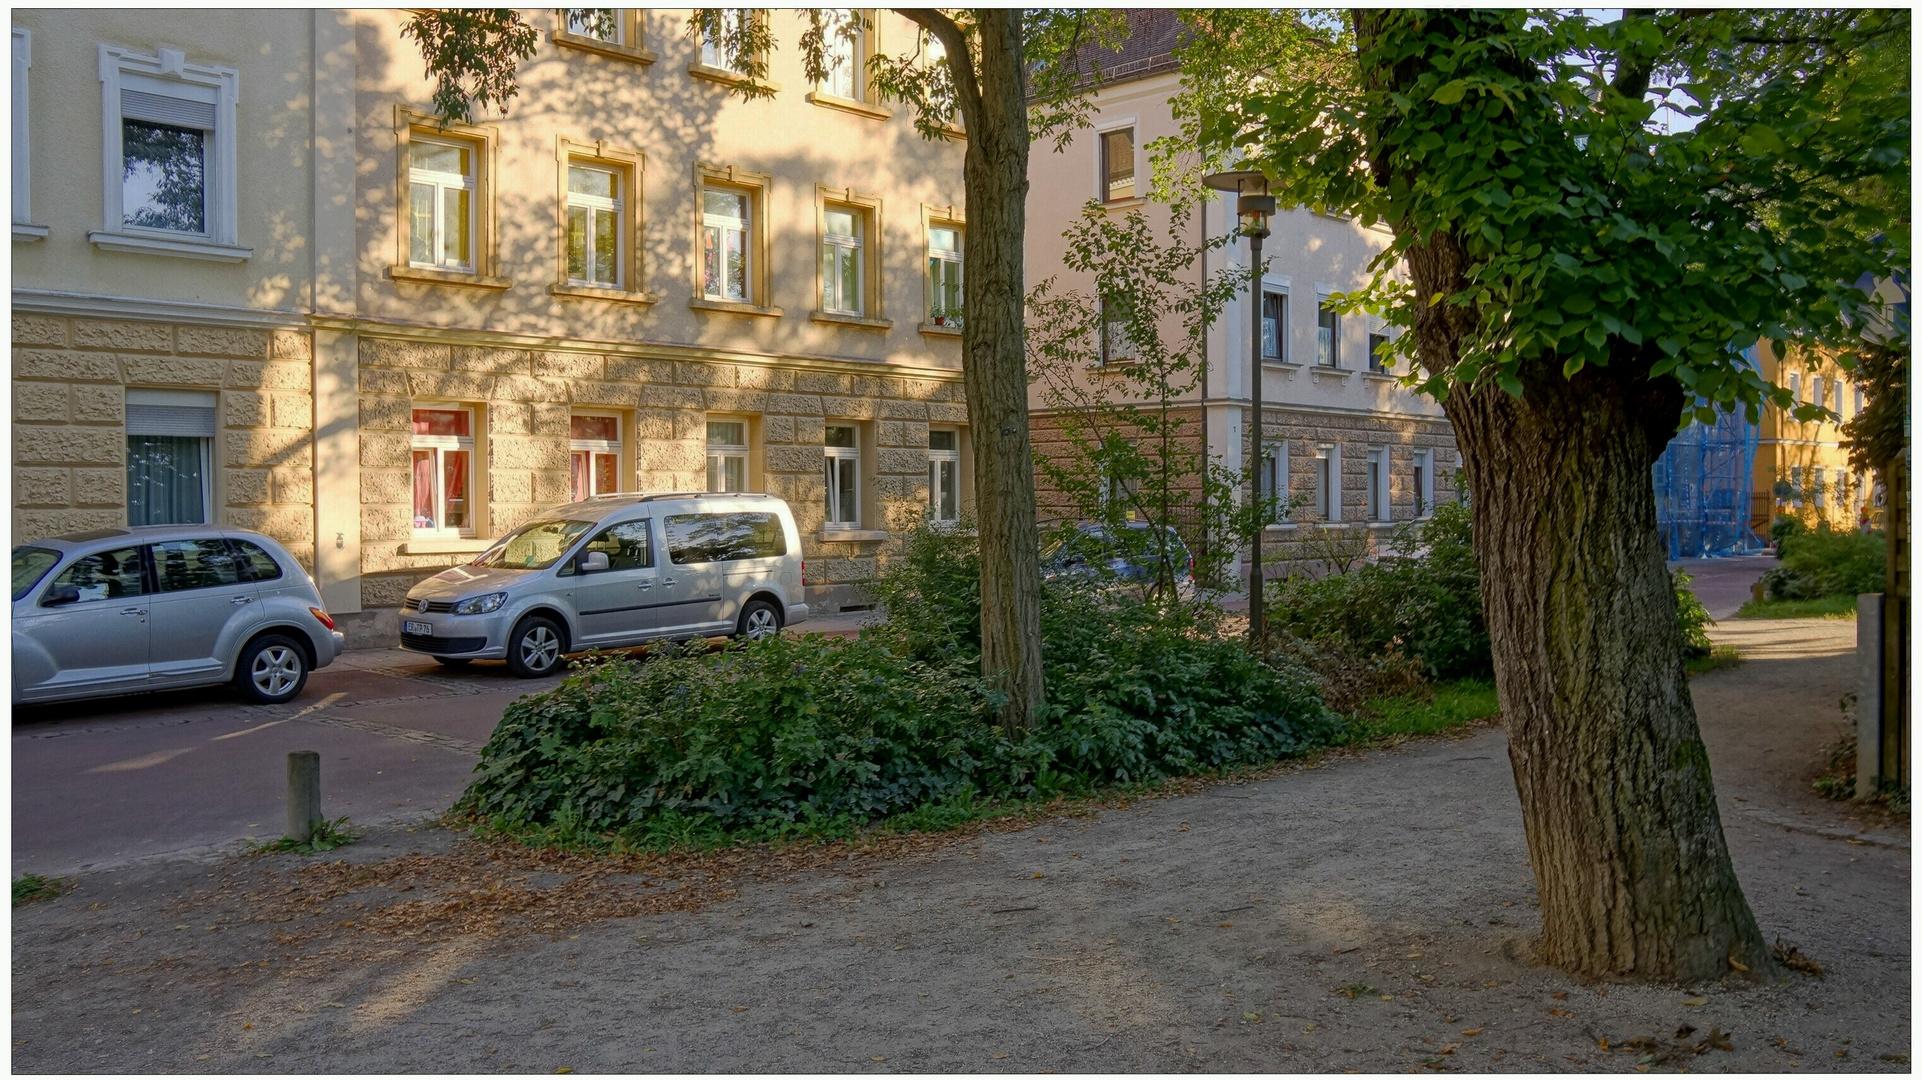 Zu Besuch in Erlangen bei meiner Tochter I (de visita en Erlangen a mi hija I)